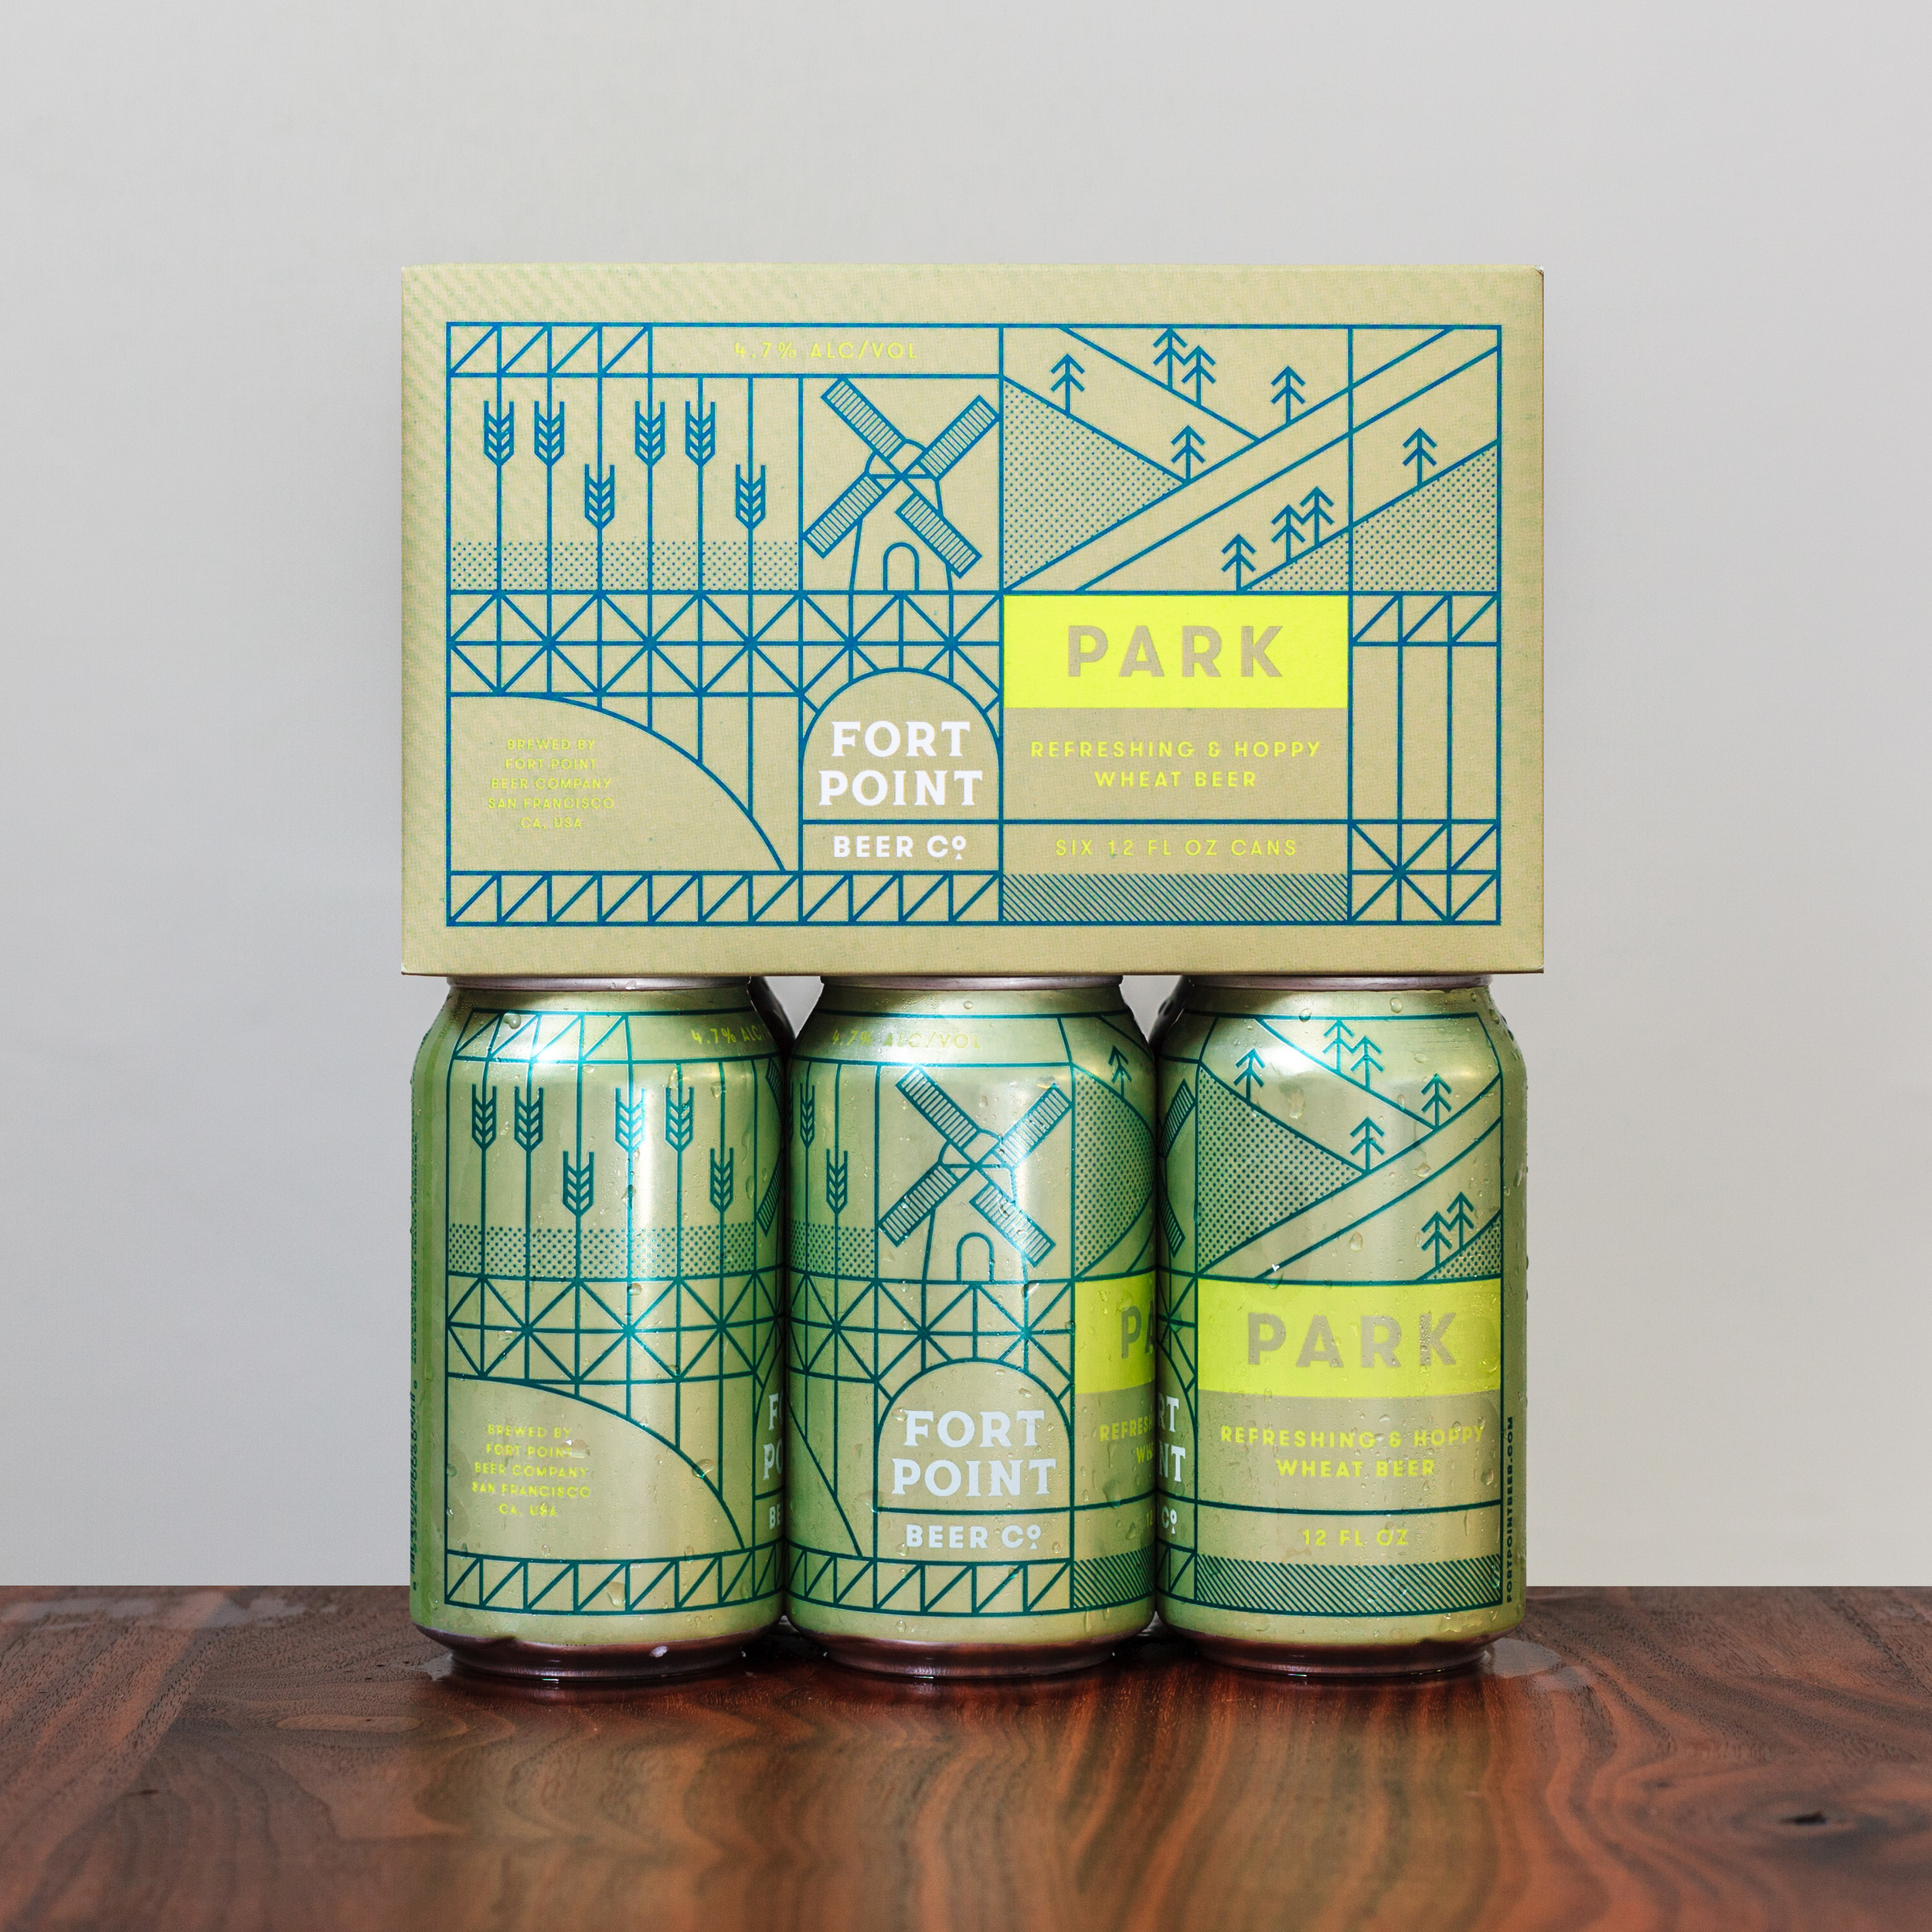 Beer & Branding: Fort Point, Part 2